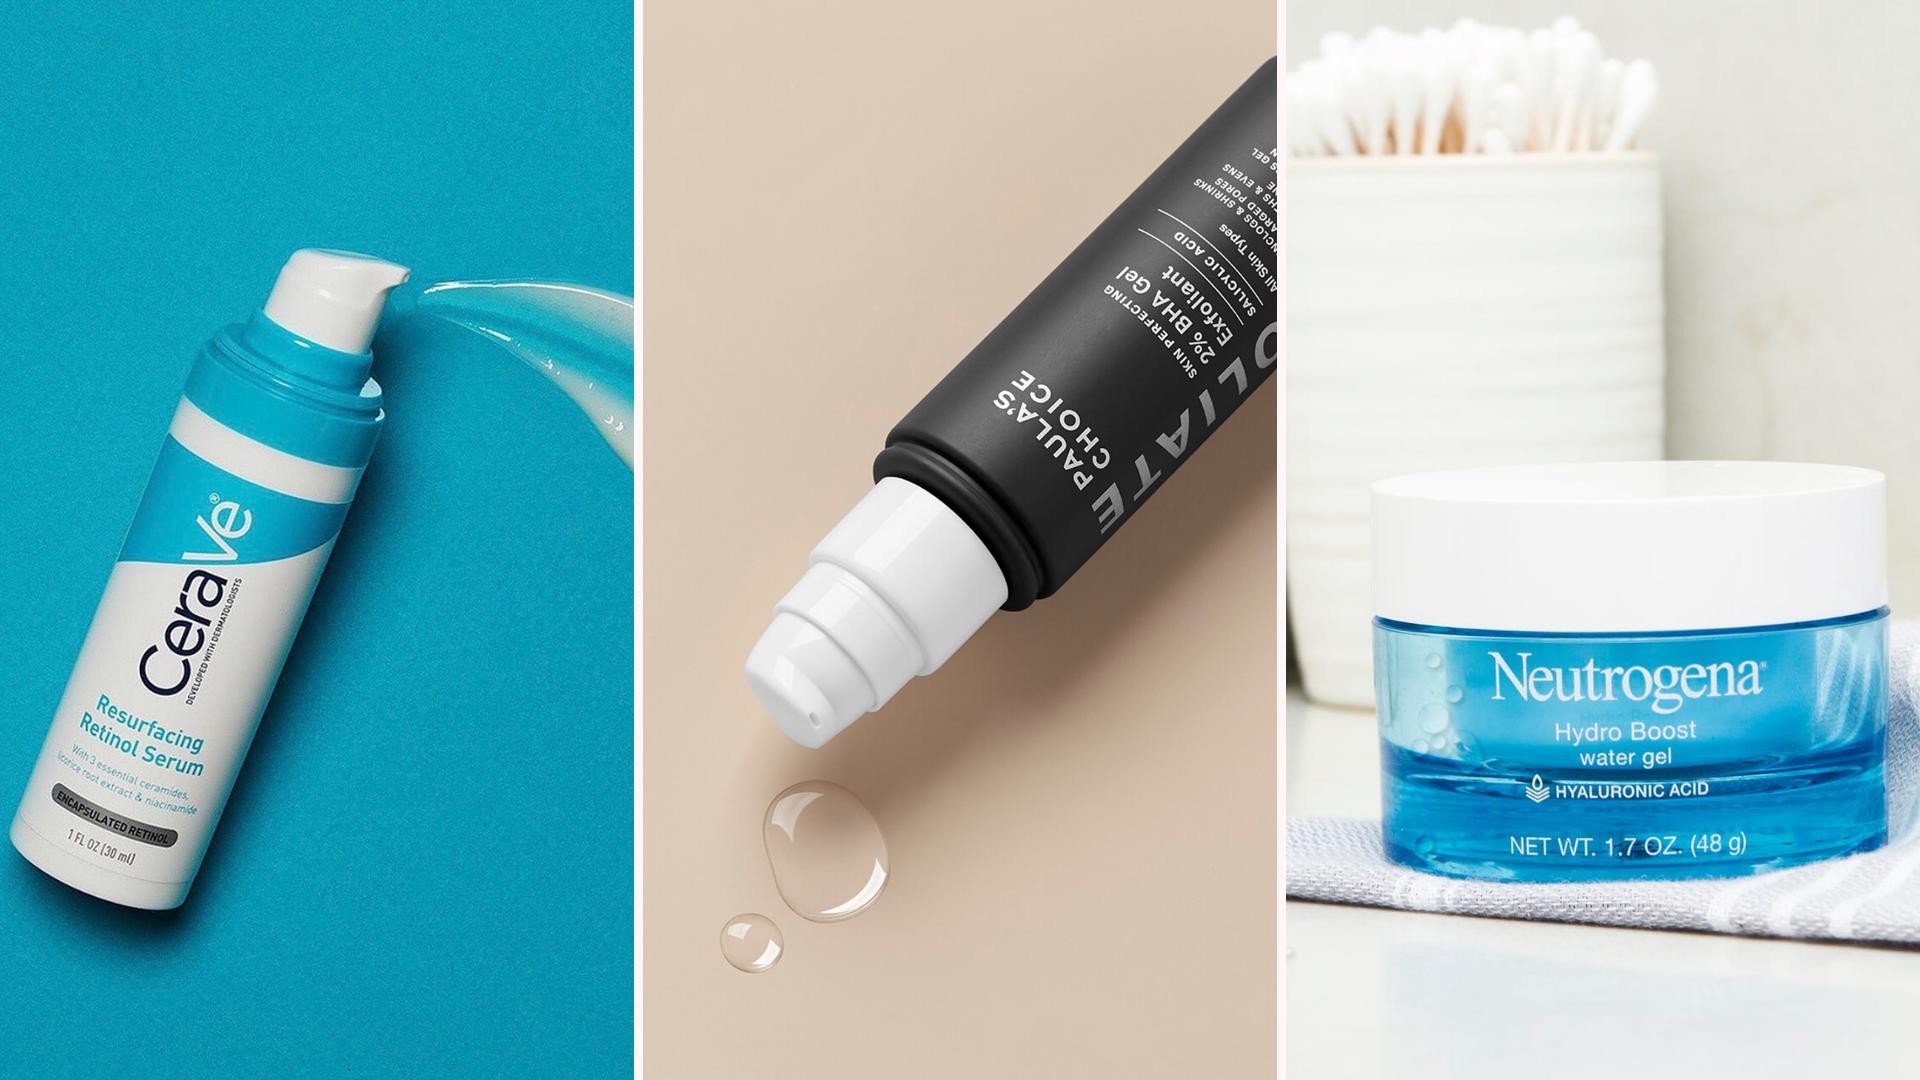 A tri-fold collage of three product shots of Cerave's Resurfacing Retinol Serum, Paula's Choice's 2% BHA Gel Exfoliant, and Neutrogena's Hydro Boost Water Gel